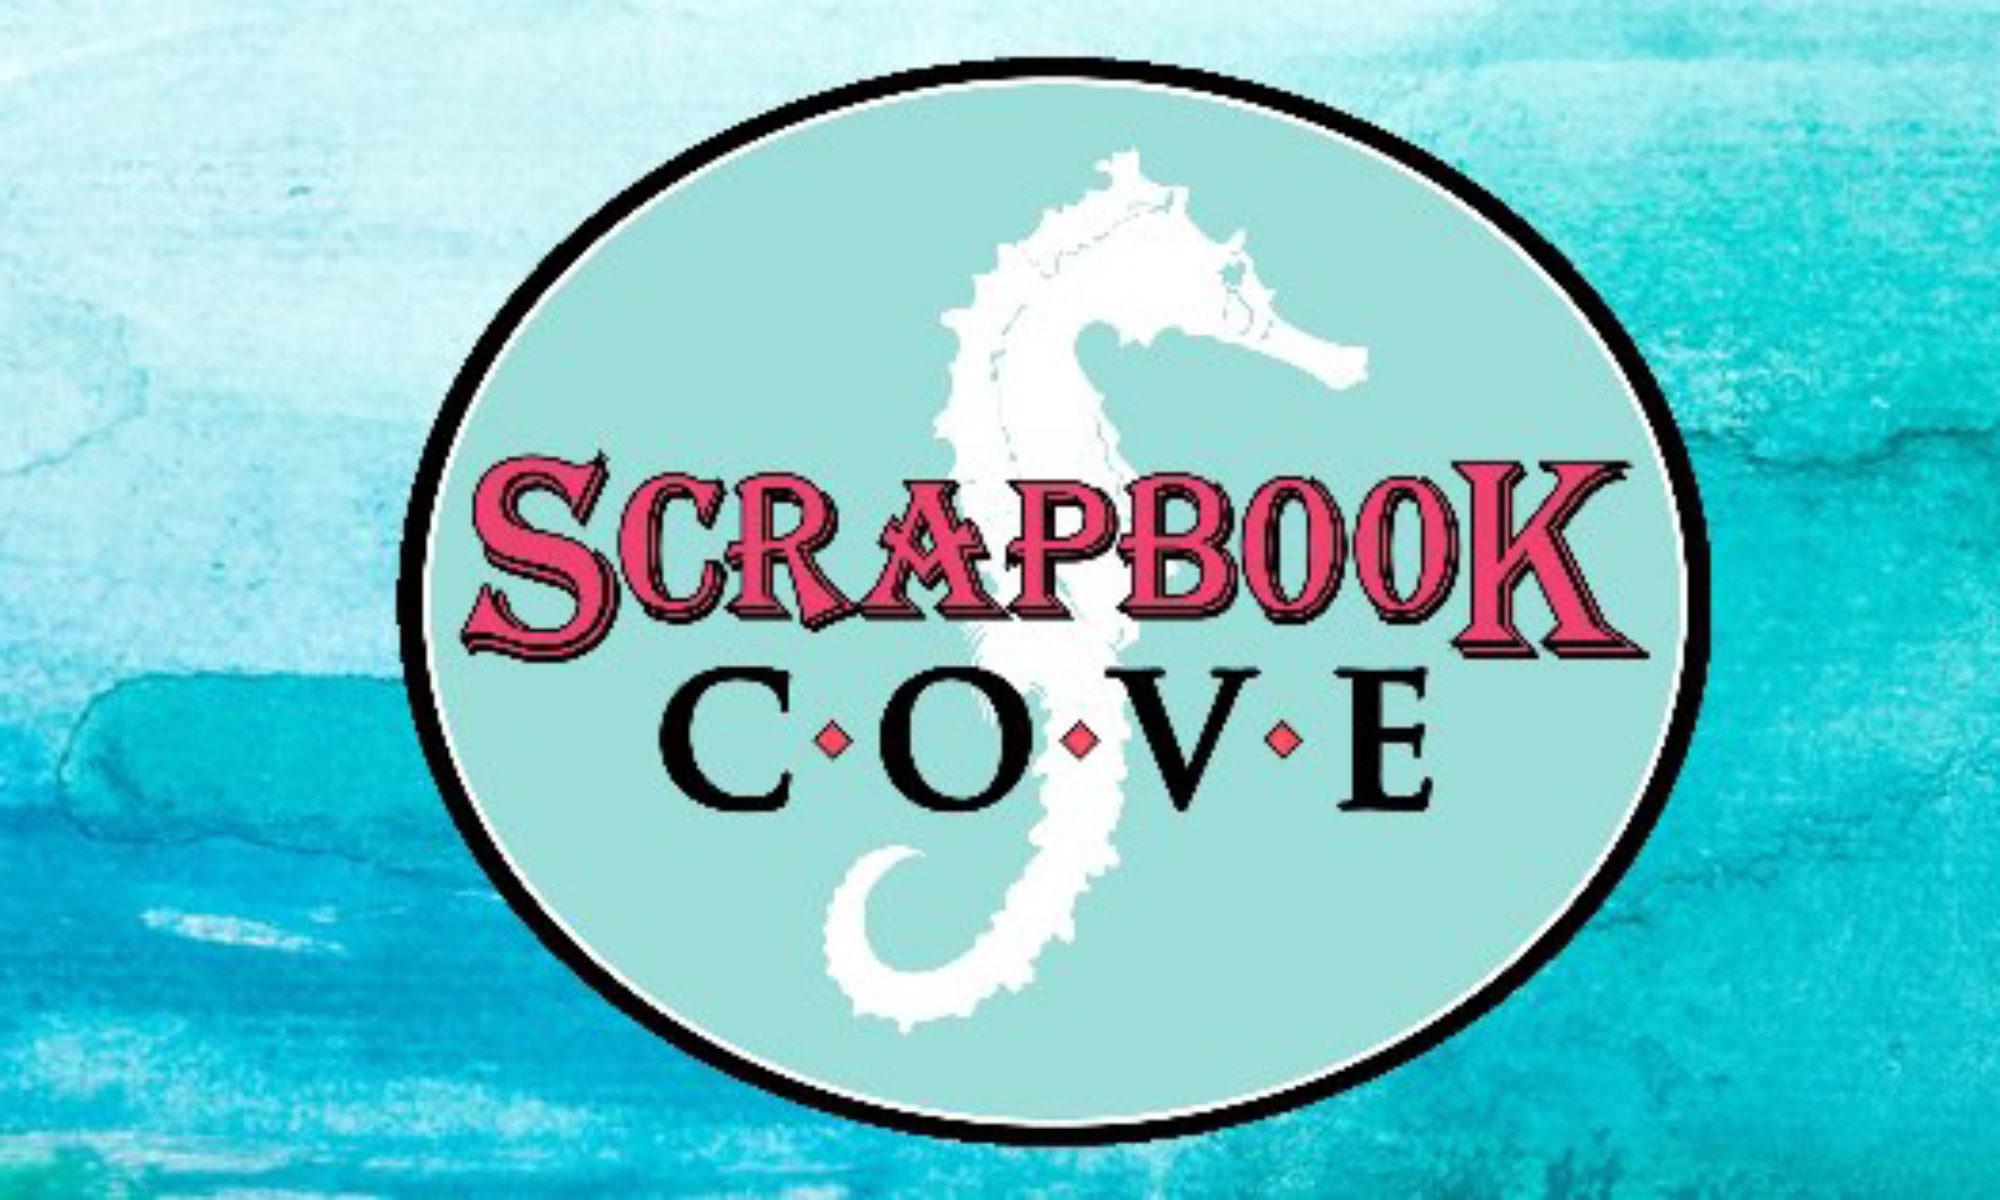 Scrapbooking - Papercrafts - cardmaking - dies - Stamps - Kits